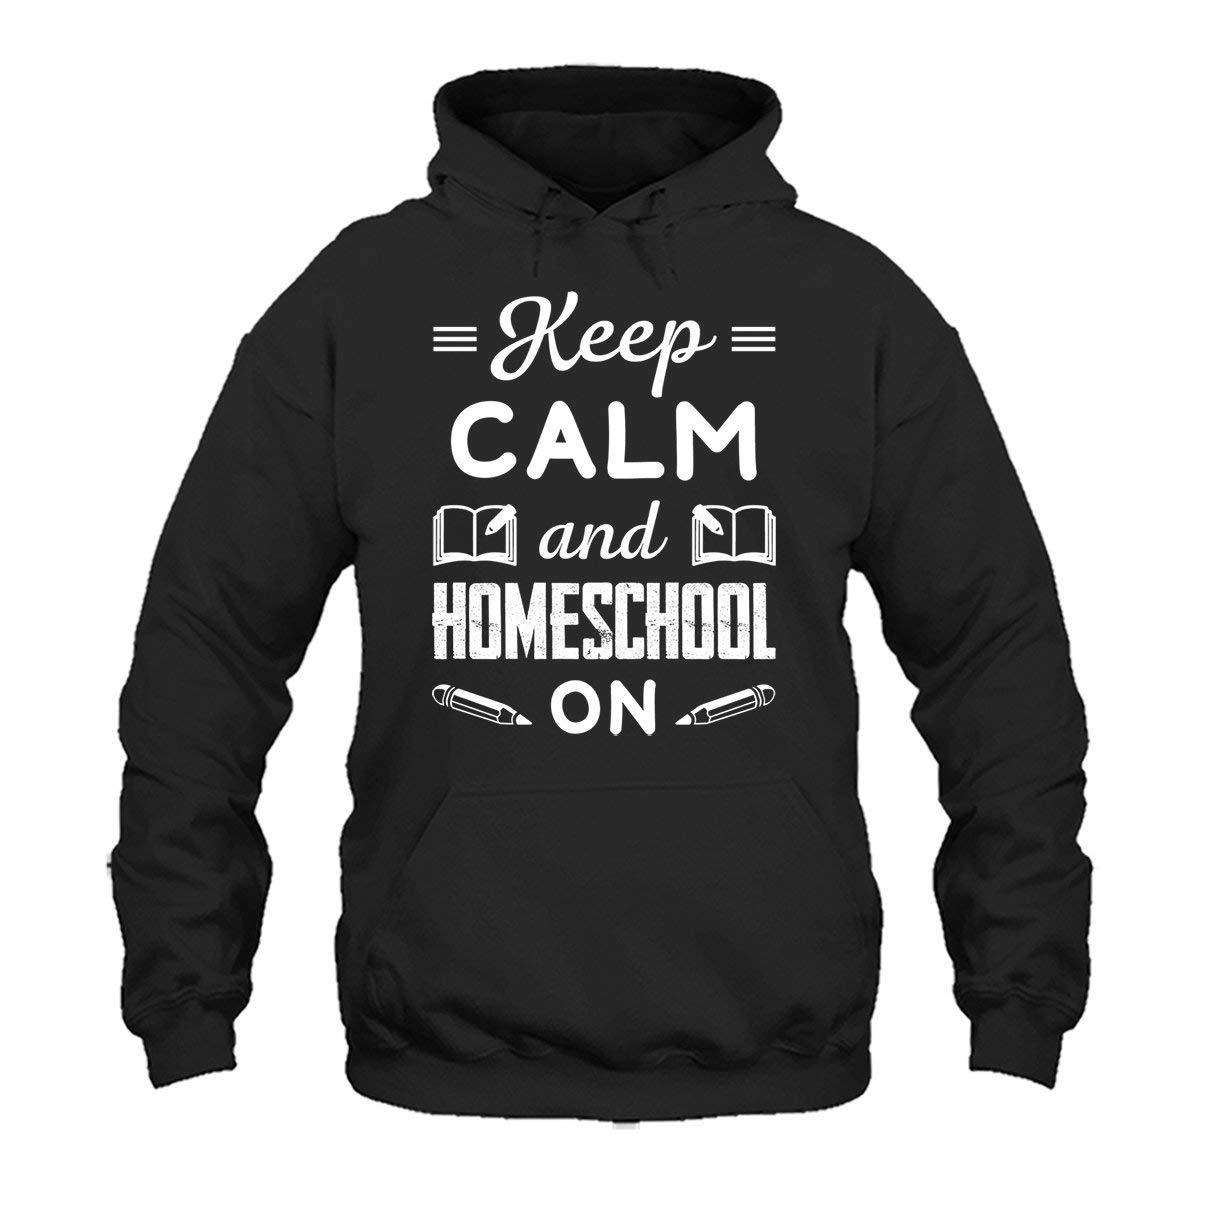 Hoodie Sweatshirt Keep Calm and Homeschool On Tee Shirt